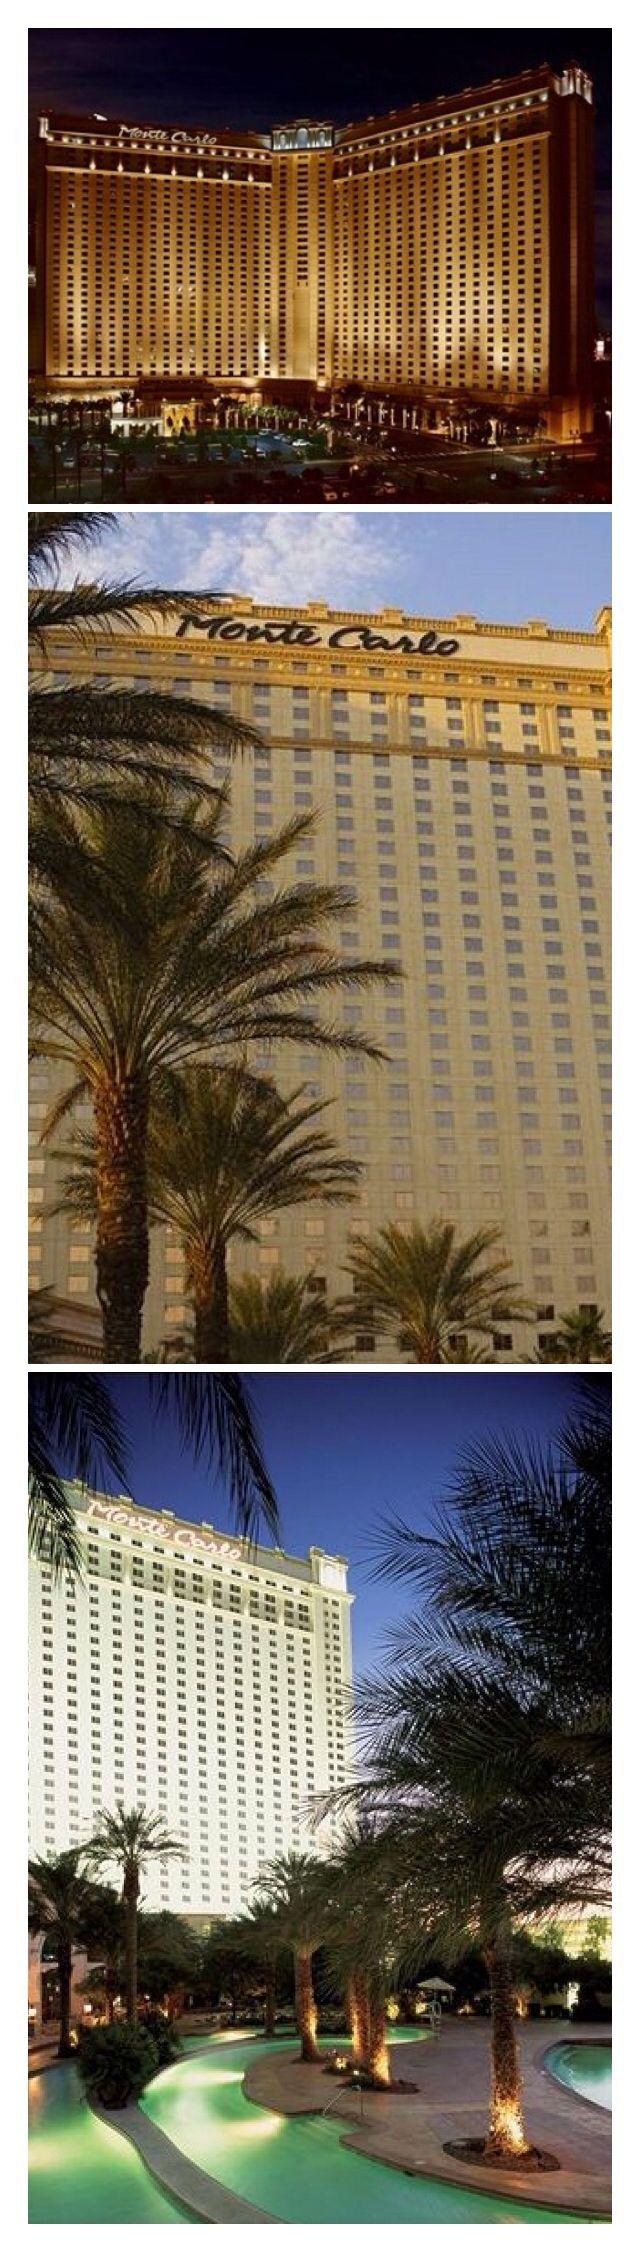 best 10+ las vegas resorts ideas on pinterest | las vegas hotels